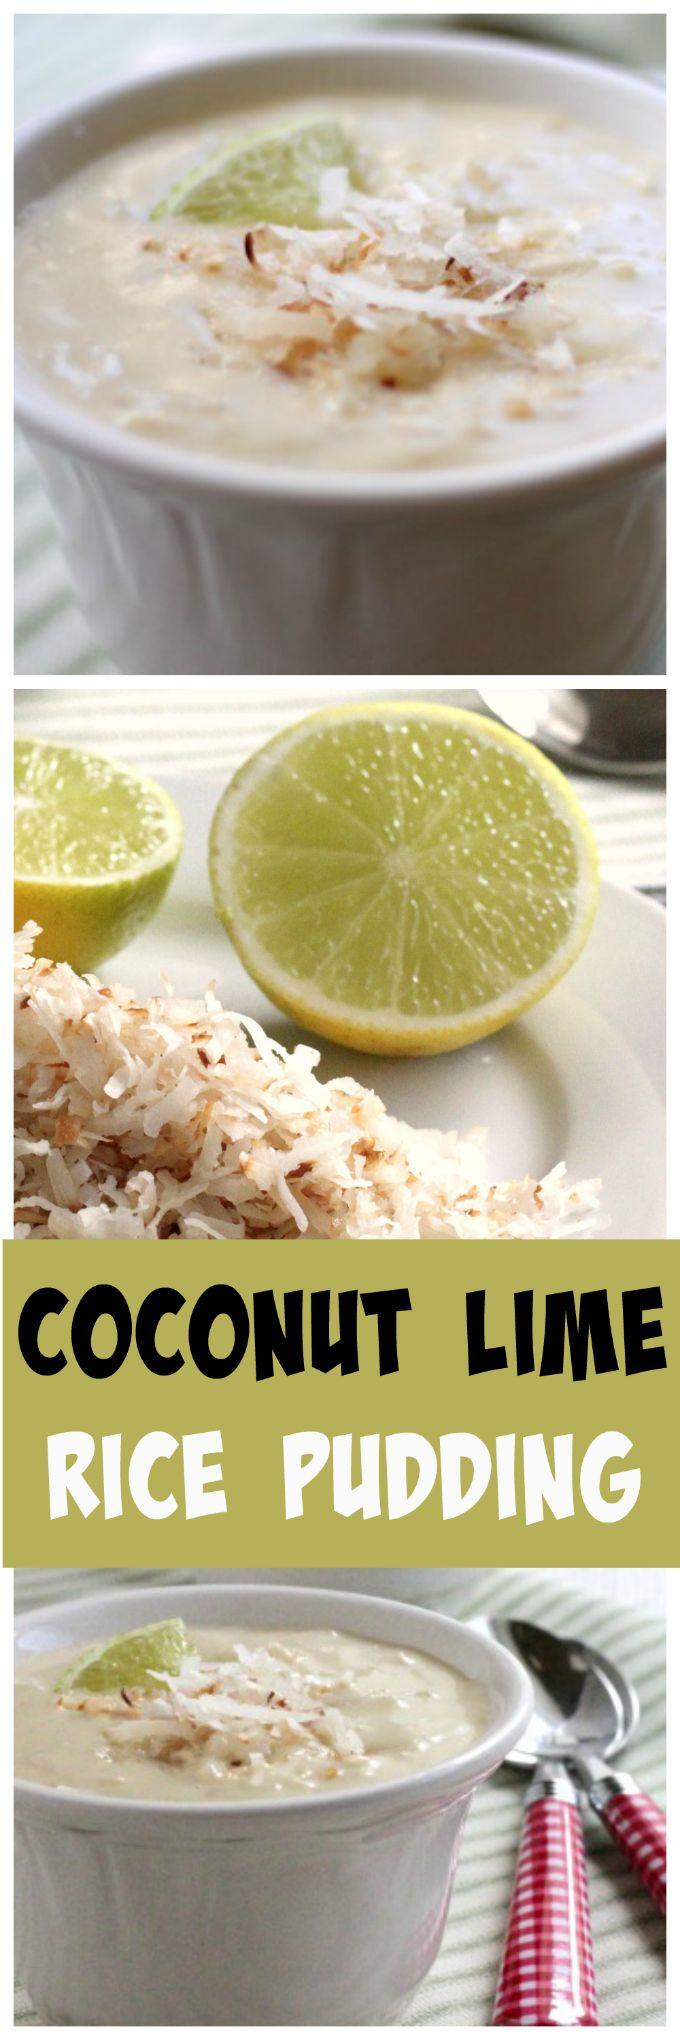 coconut lime rice pudding @createdbydiane